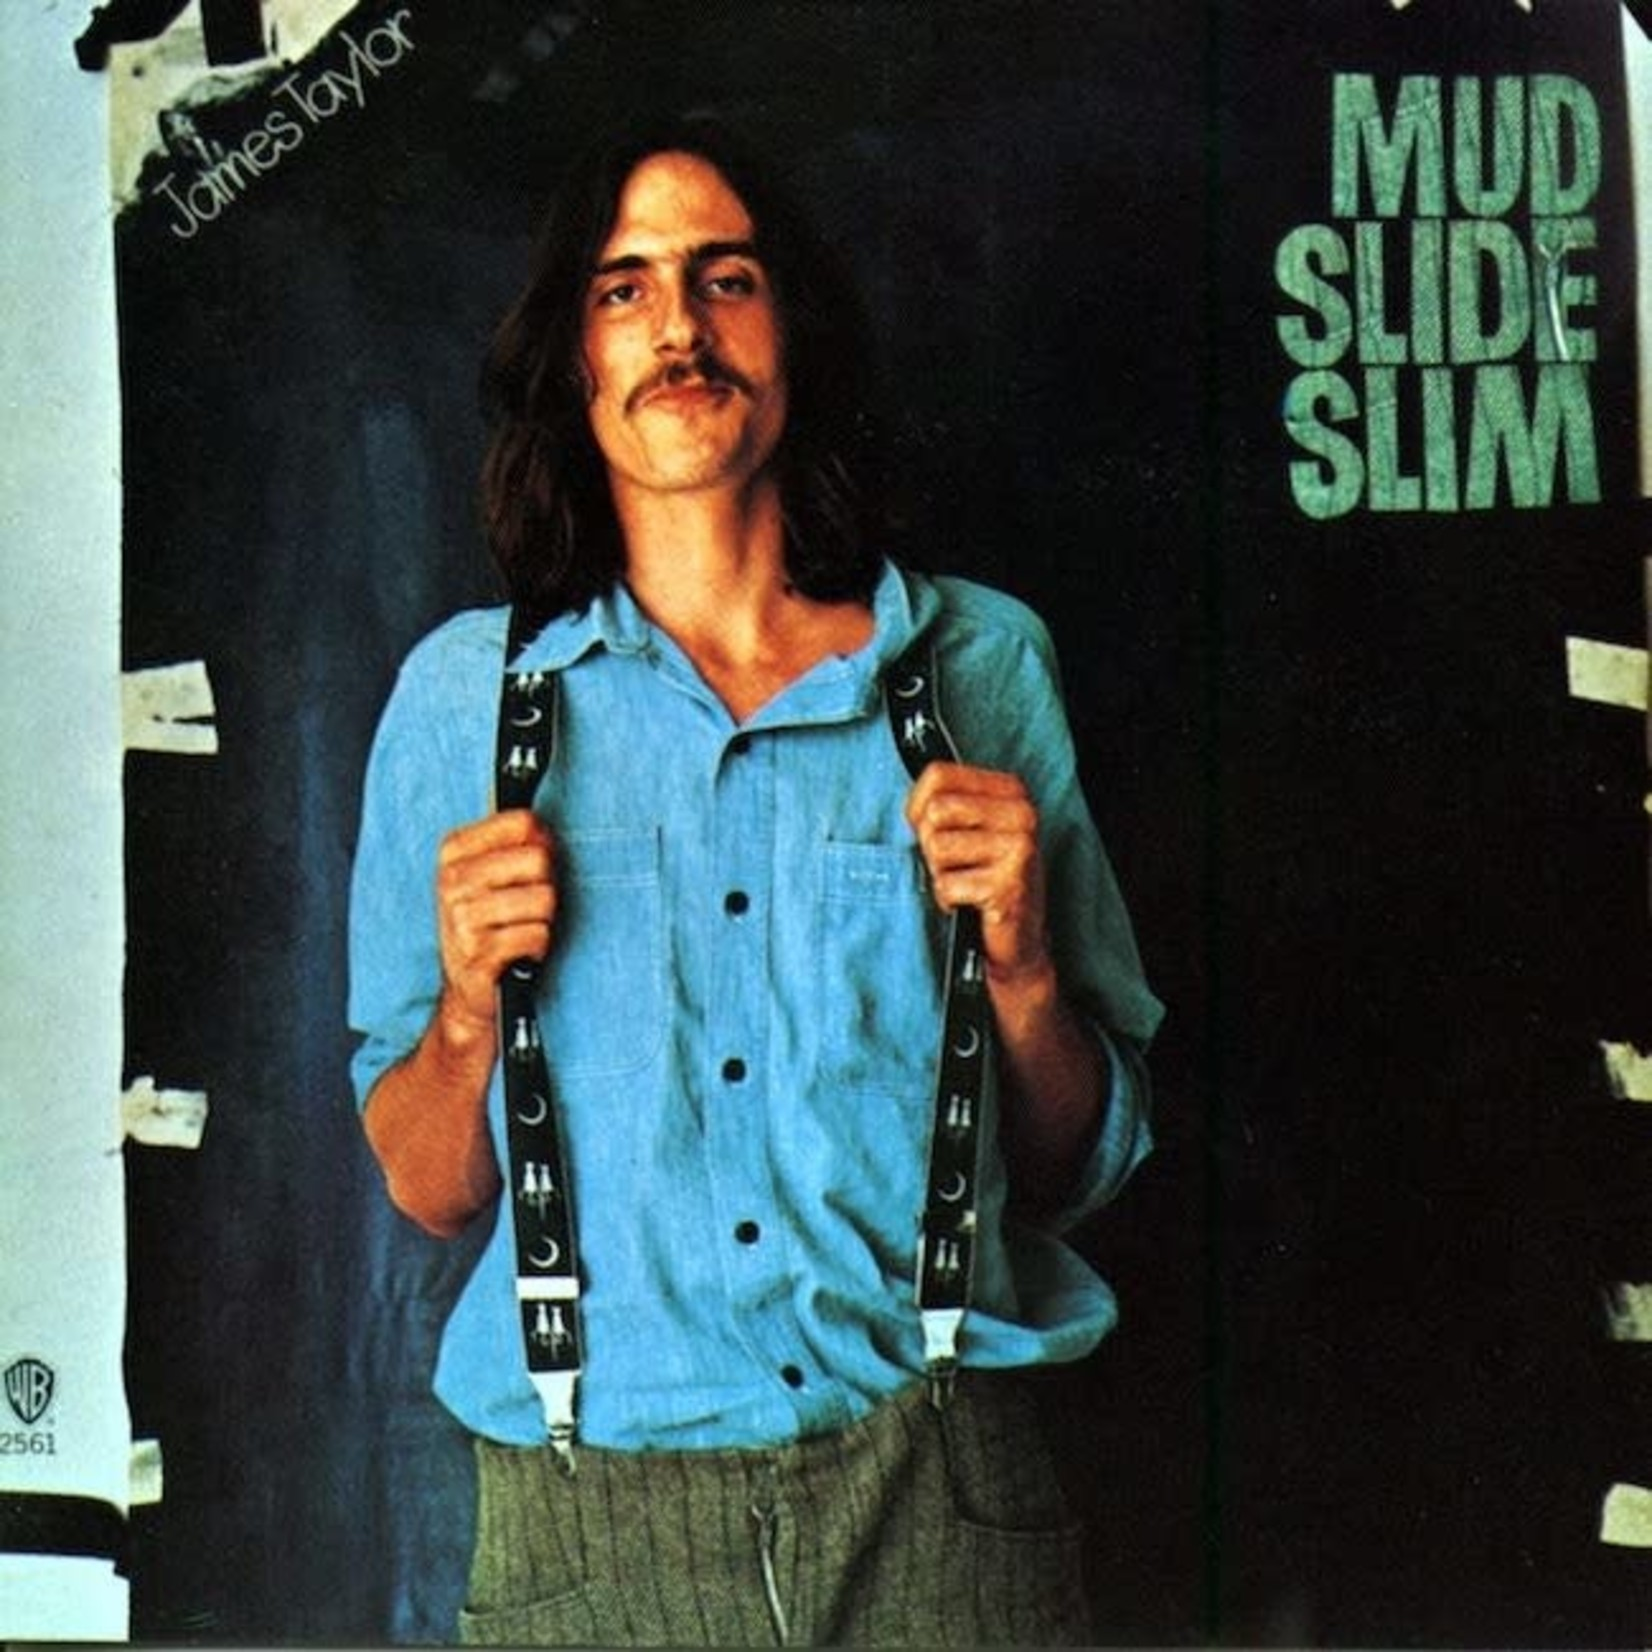 [Vintage] Taylor, James: Mud Slide Slim